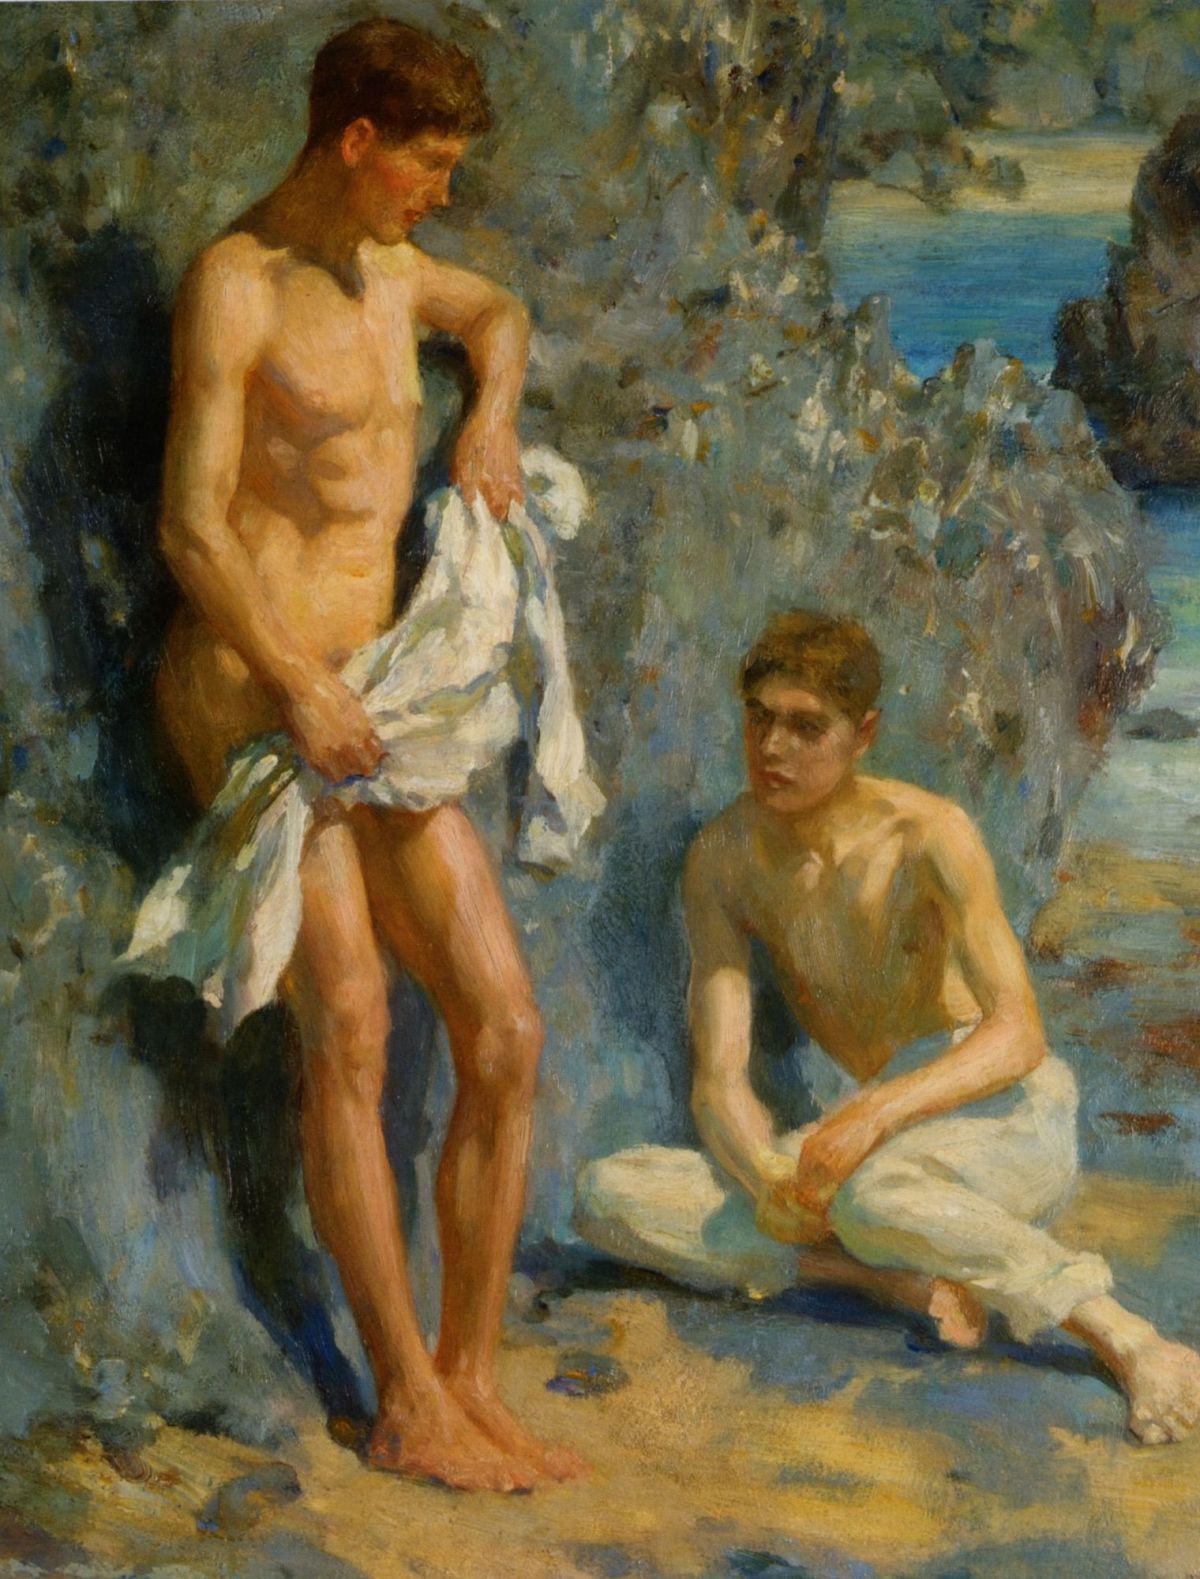 After The Bath by Henry Scott Tuke